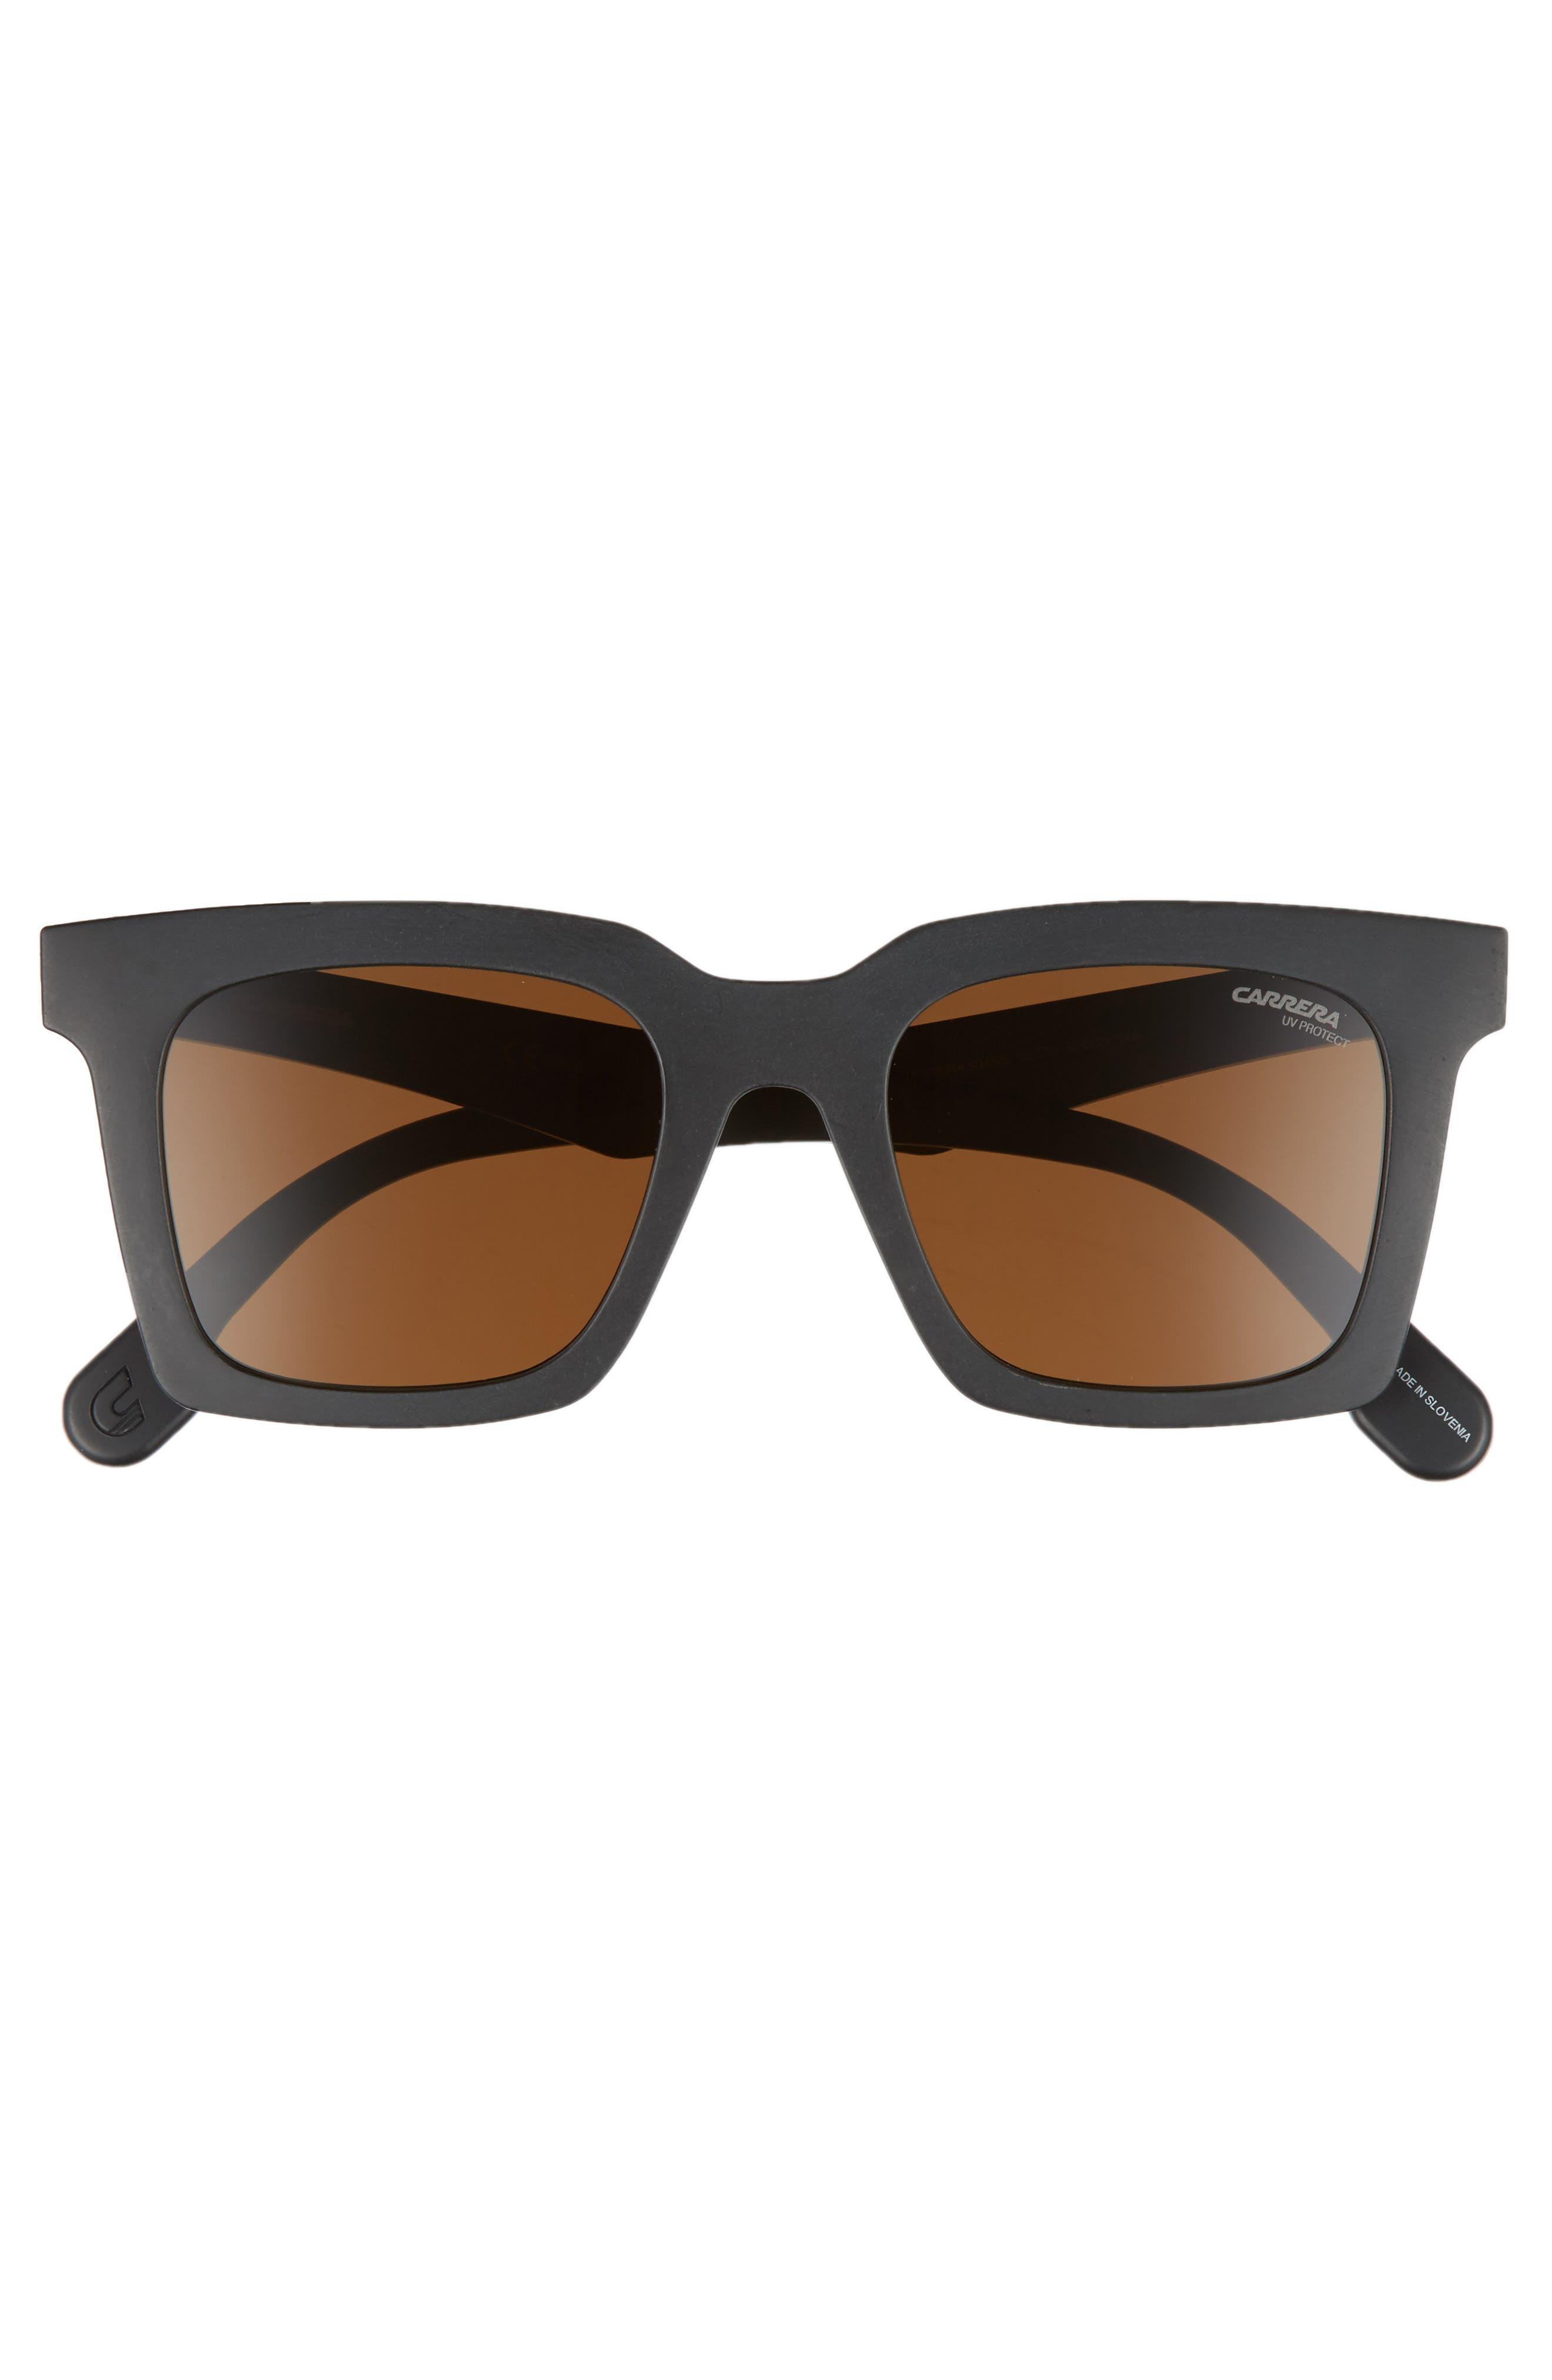 5045S 50mm Sunglasses,                             Alternate thumbnail 2, color,                             001